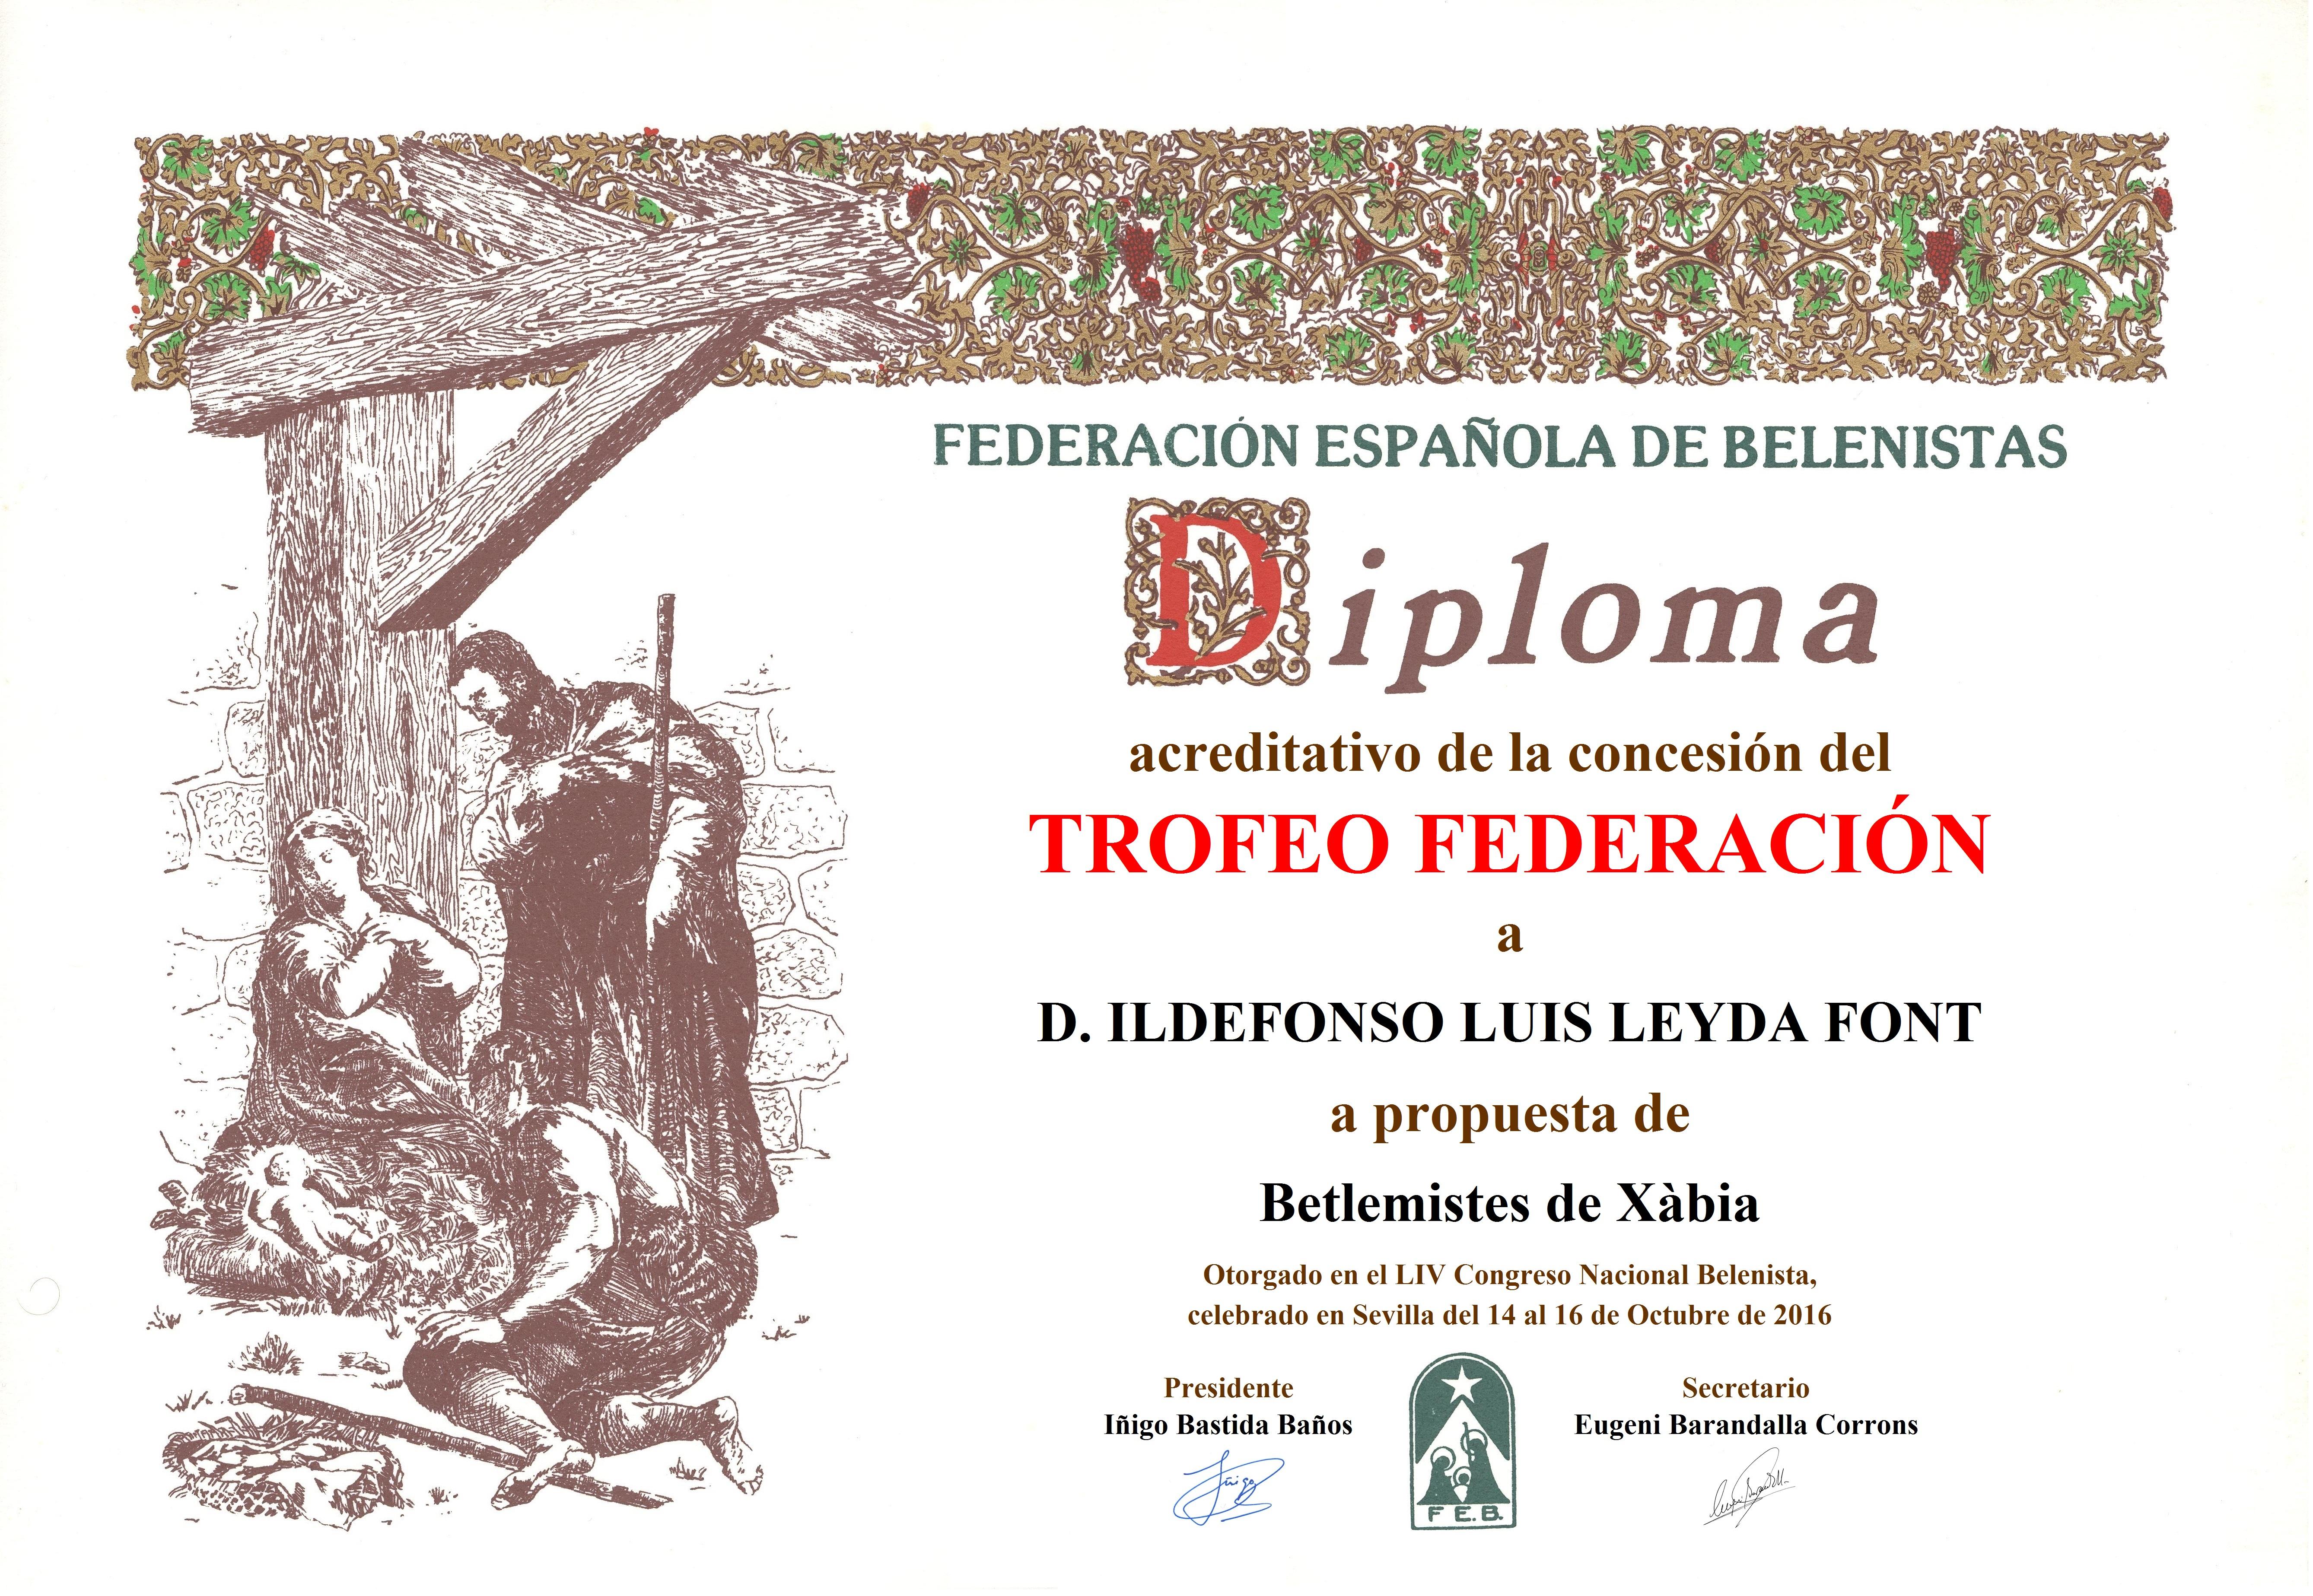 Ildefonso Luis Leyda Font - Diploma Trofeo FEB 2016